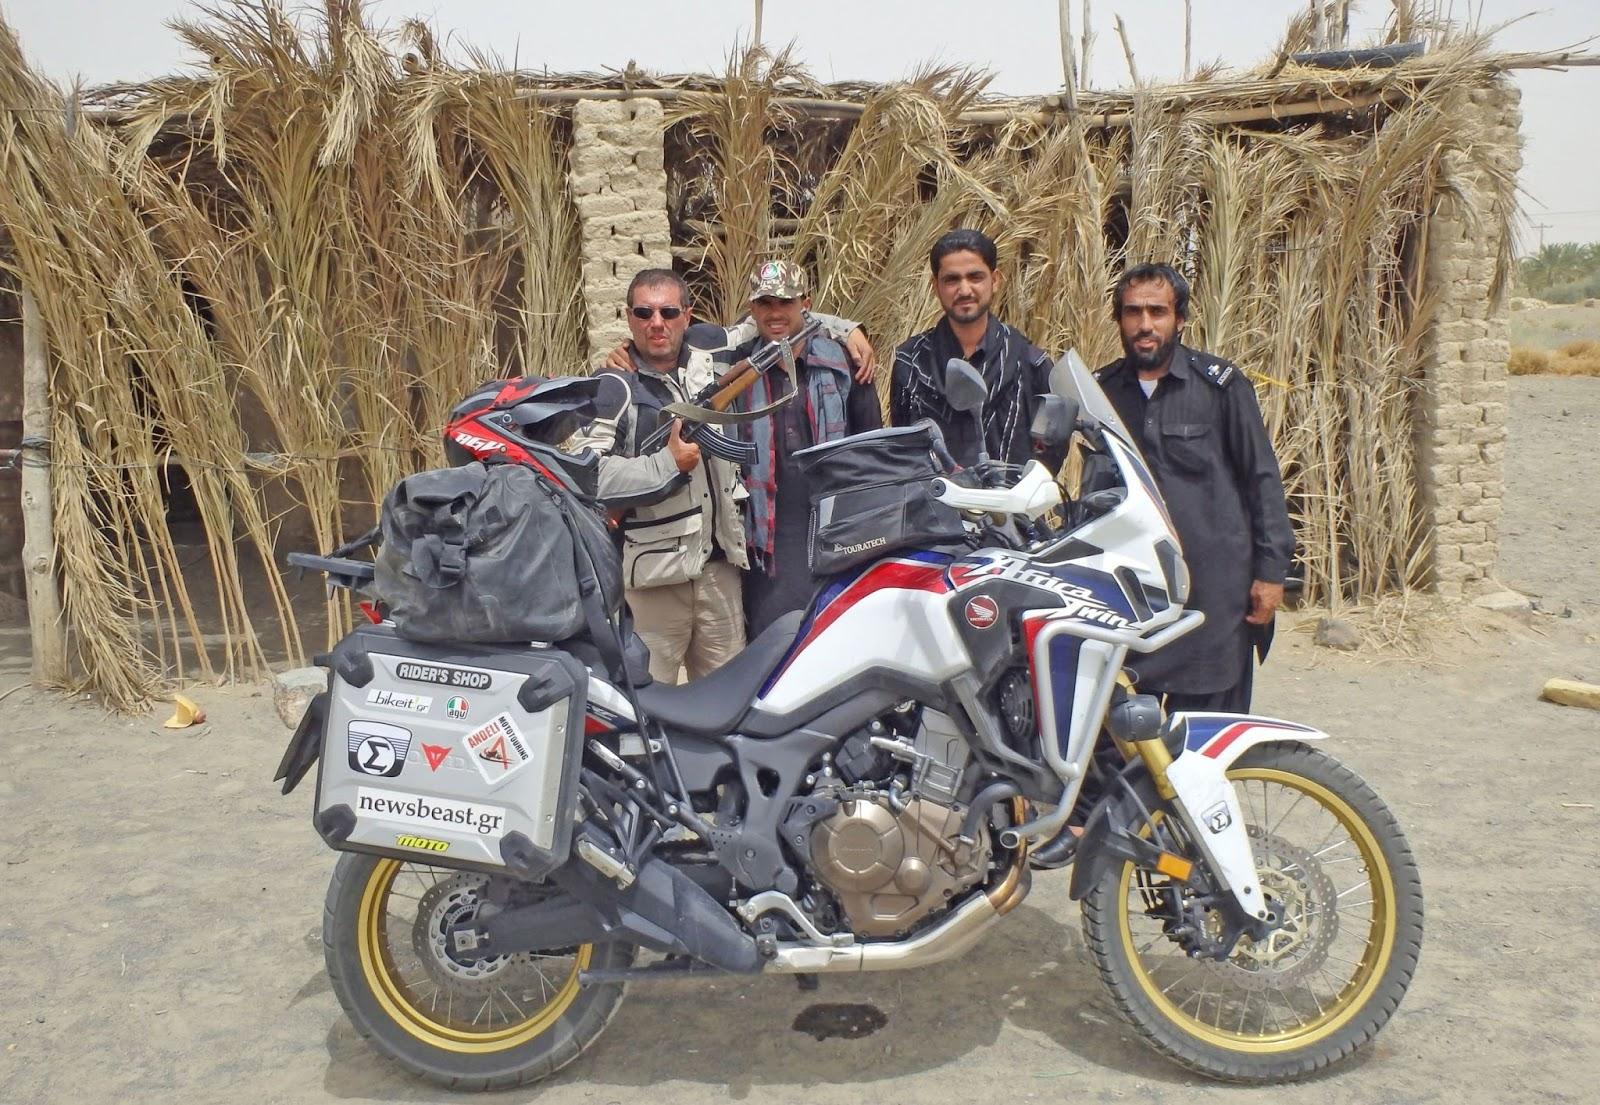 TRANS - ASIAN 2017: ένα ταξίδι στο δρόμο του μεταξιού και των μπαχαρικών, μήκους 16.450 χλμ. με Honda CRF1000L Africa Twin